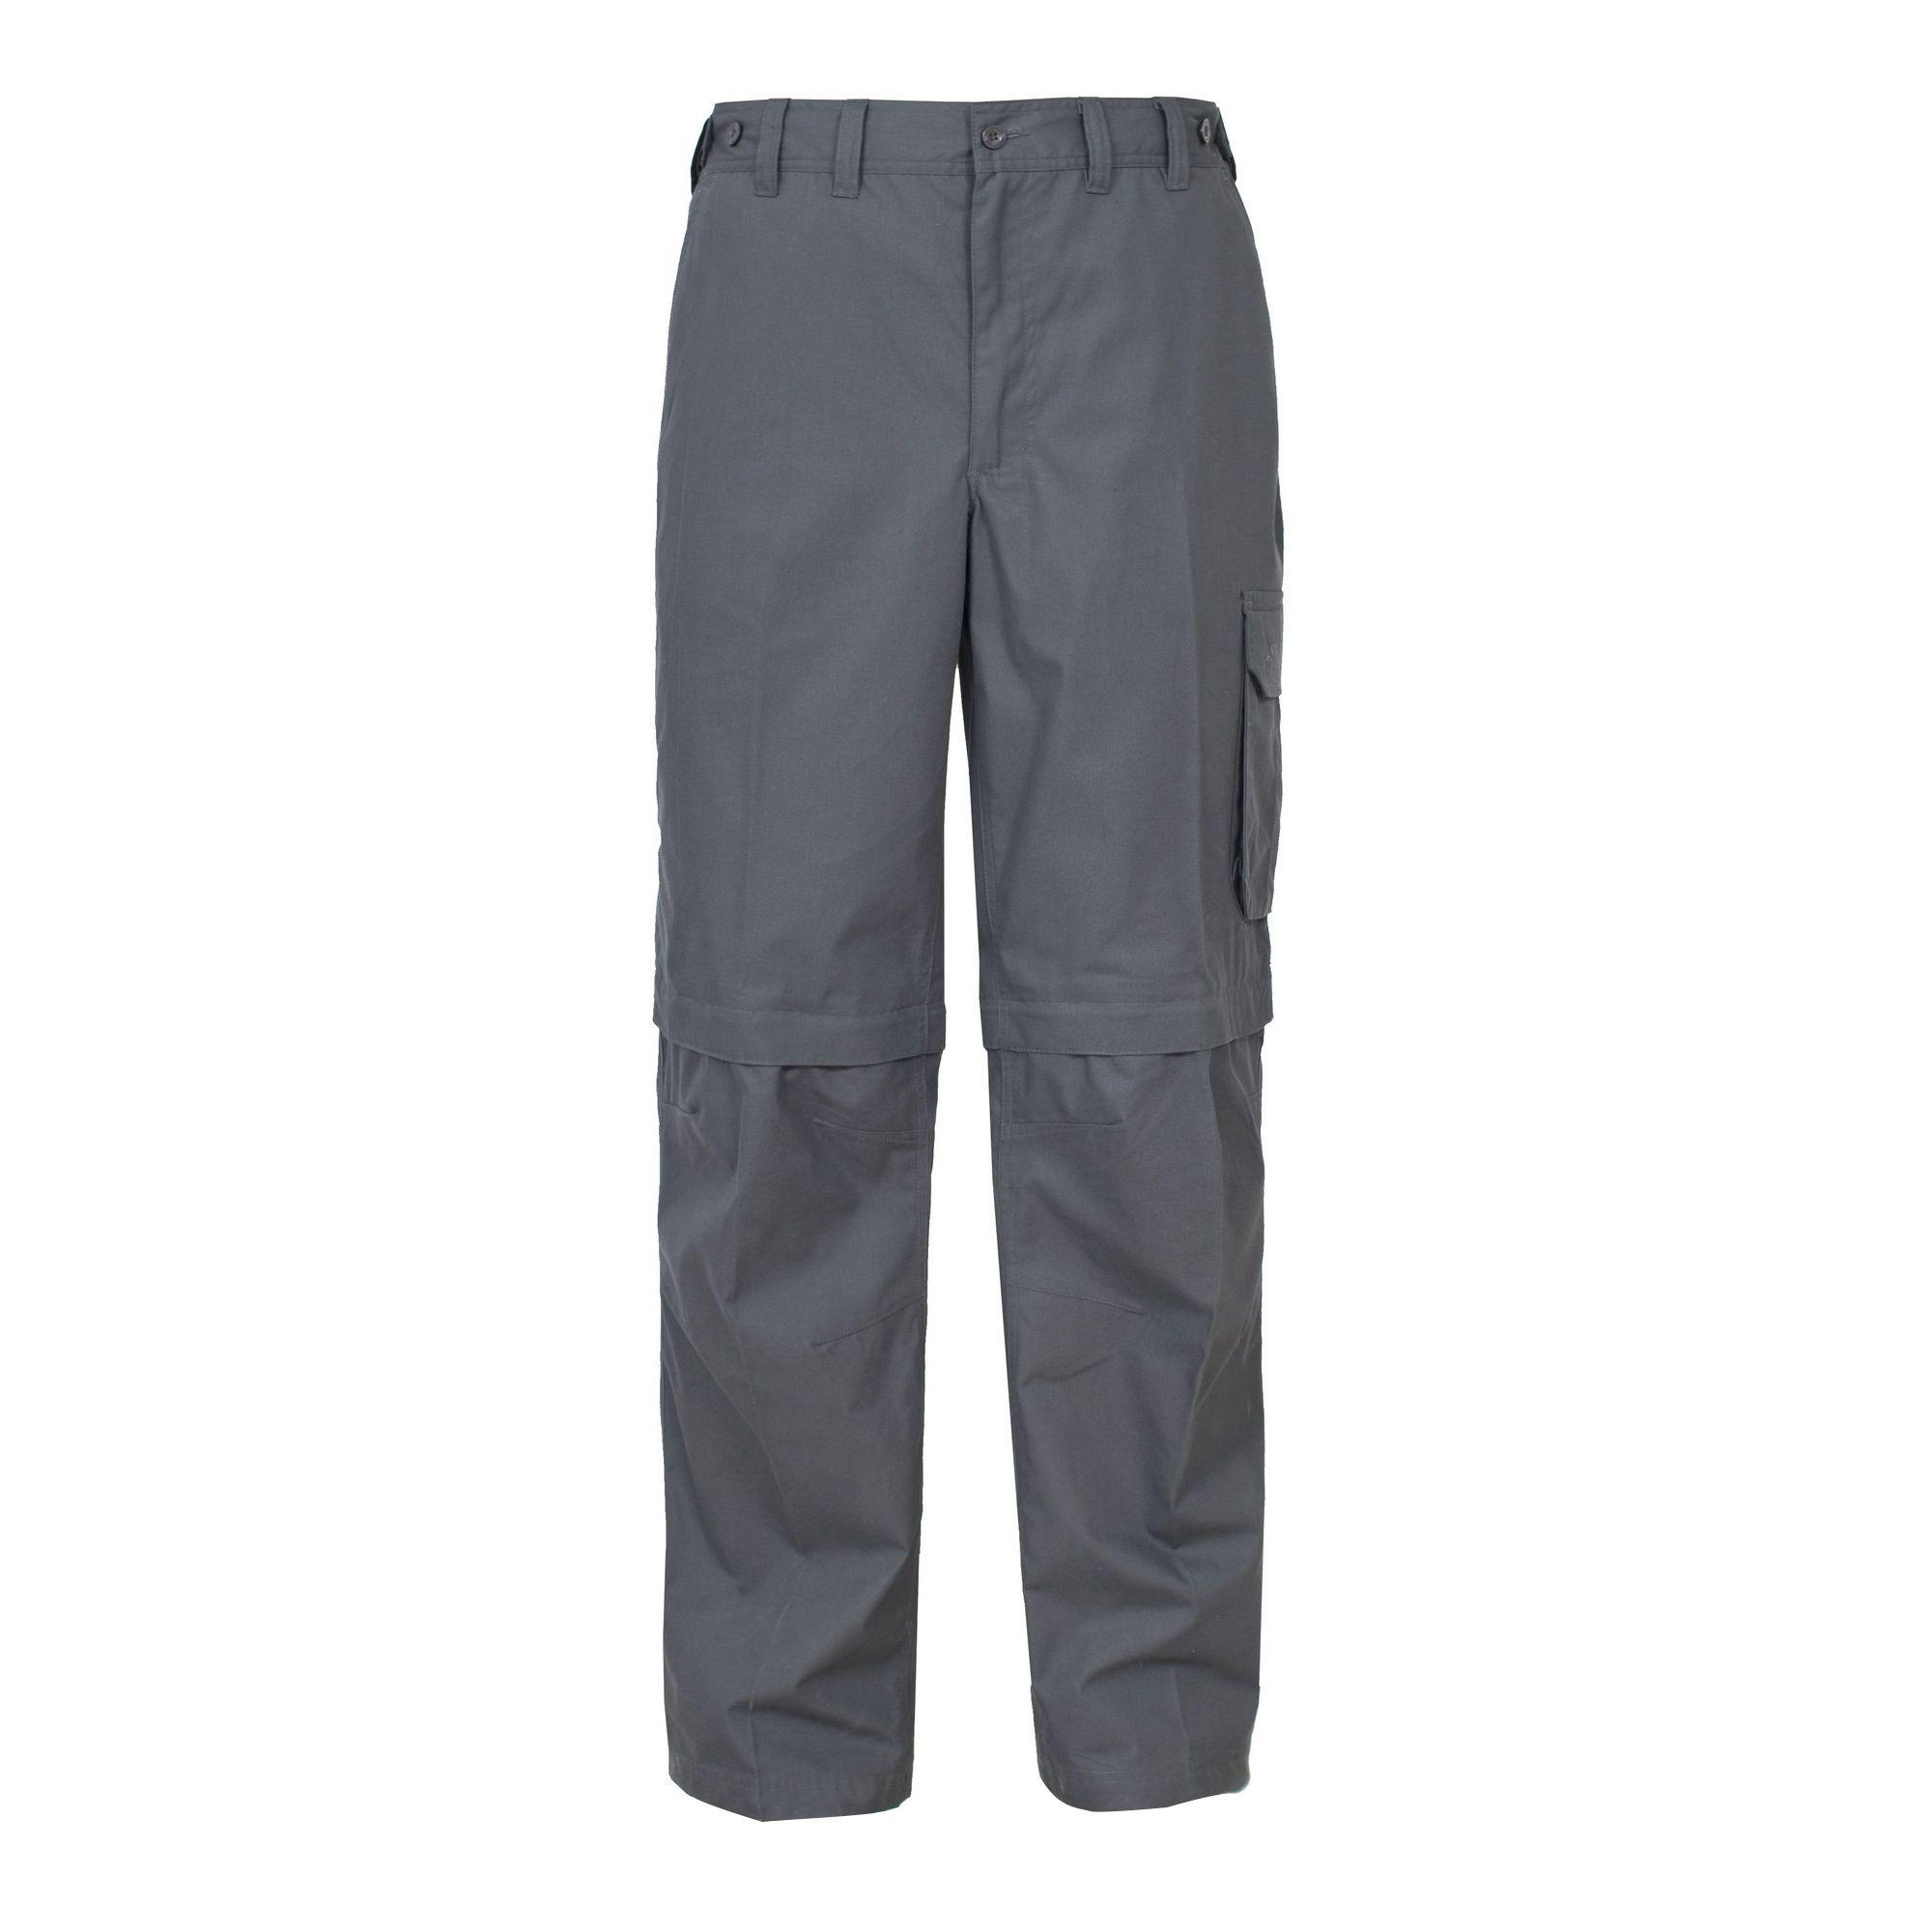 Trespass Mens Mallik Convertible Water Repellent Cargo Trousers